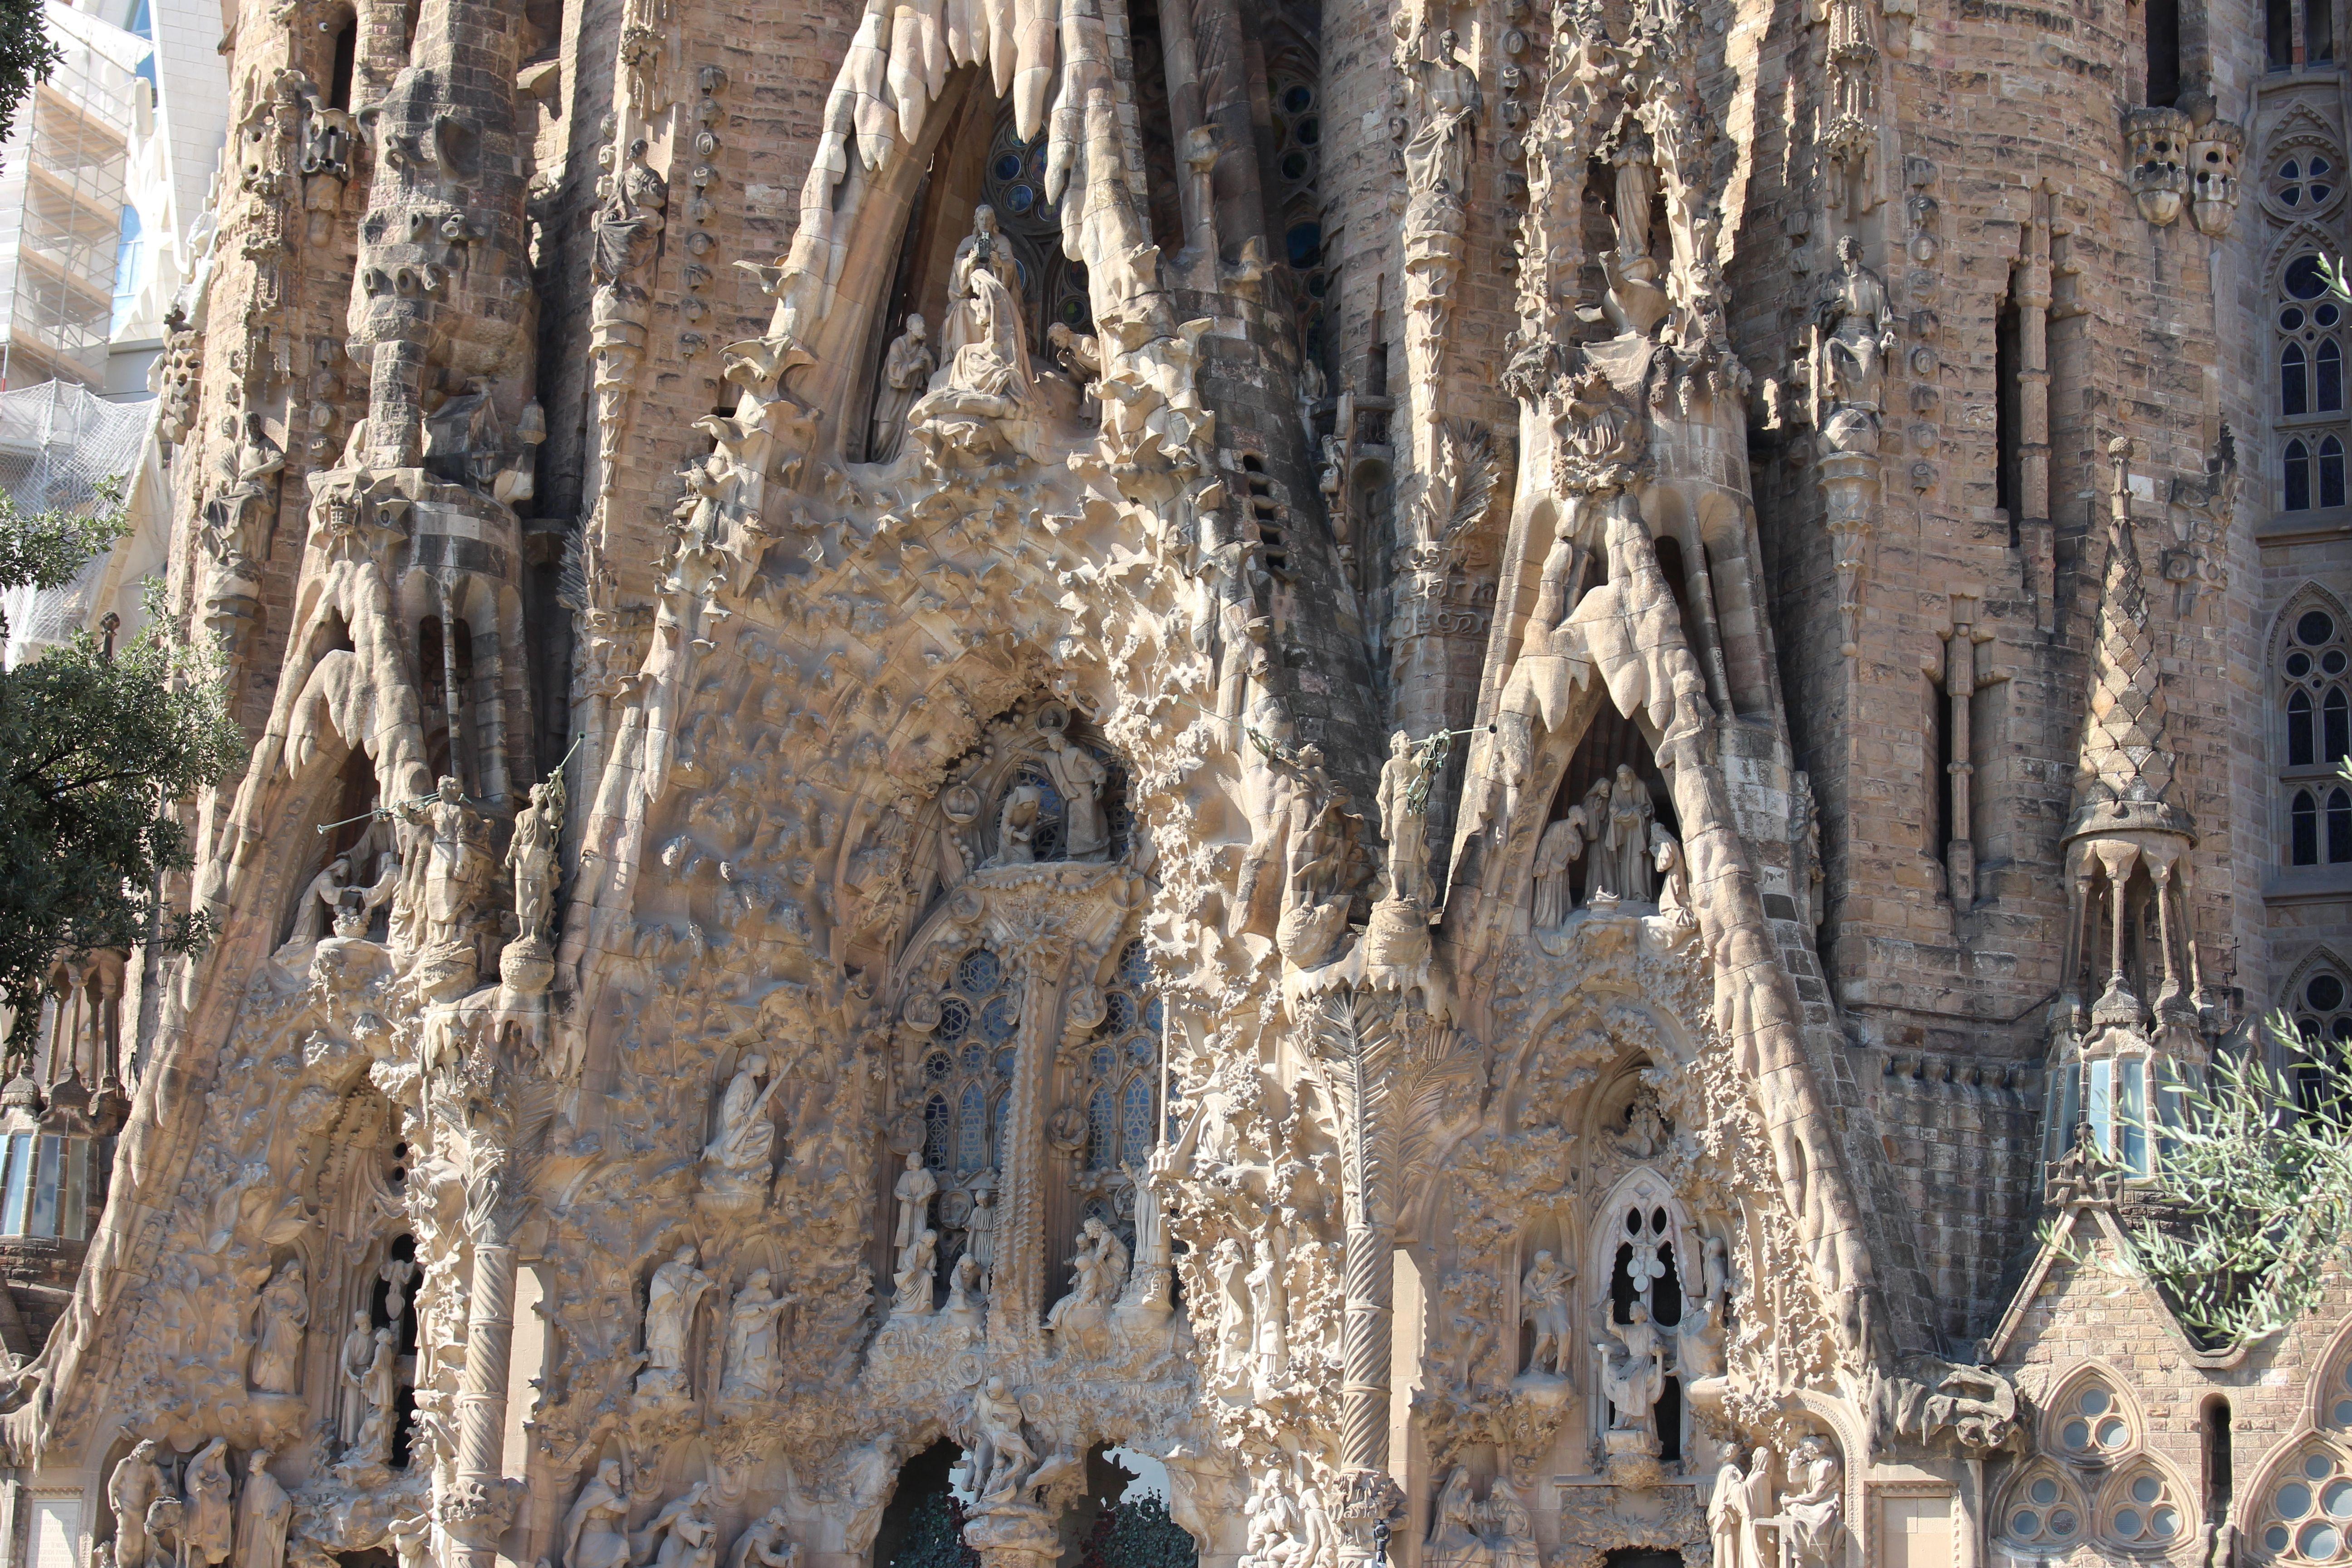 Sagrada Familia Antoni Gaudi Sagrada Familia Gaudi Cité Jardin